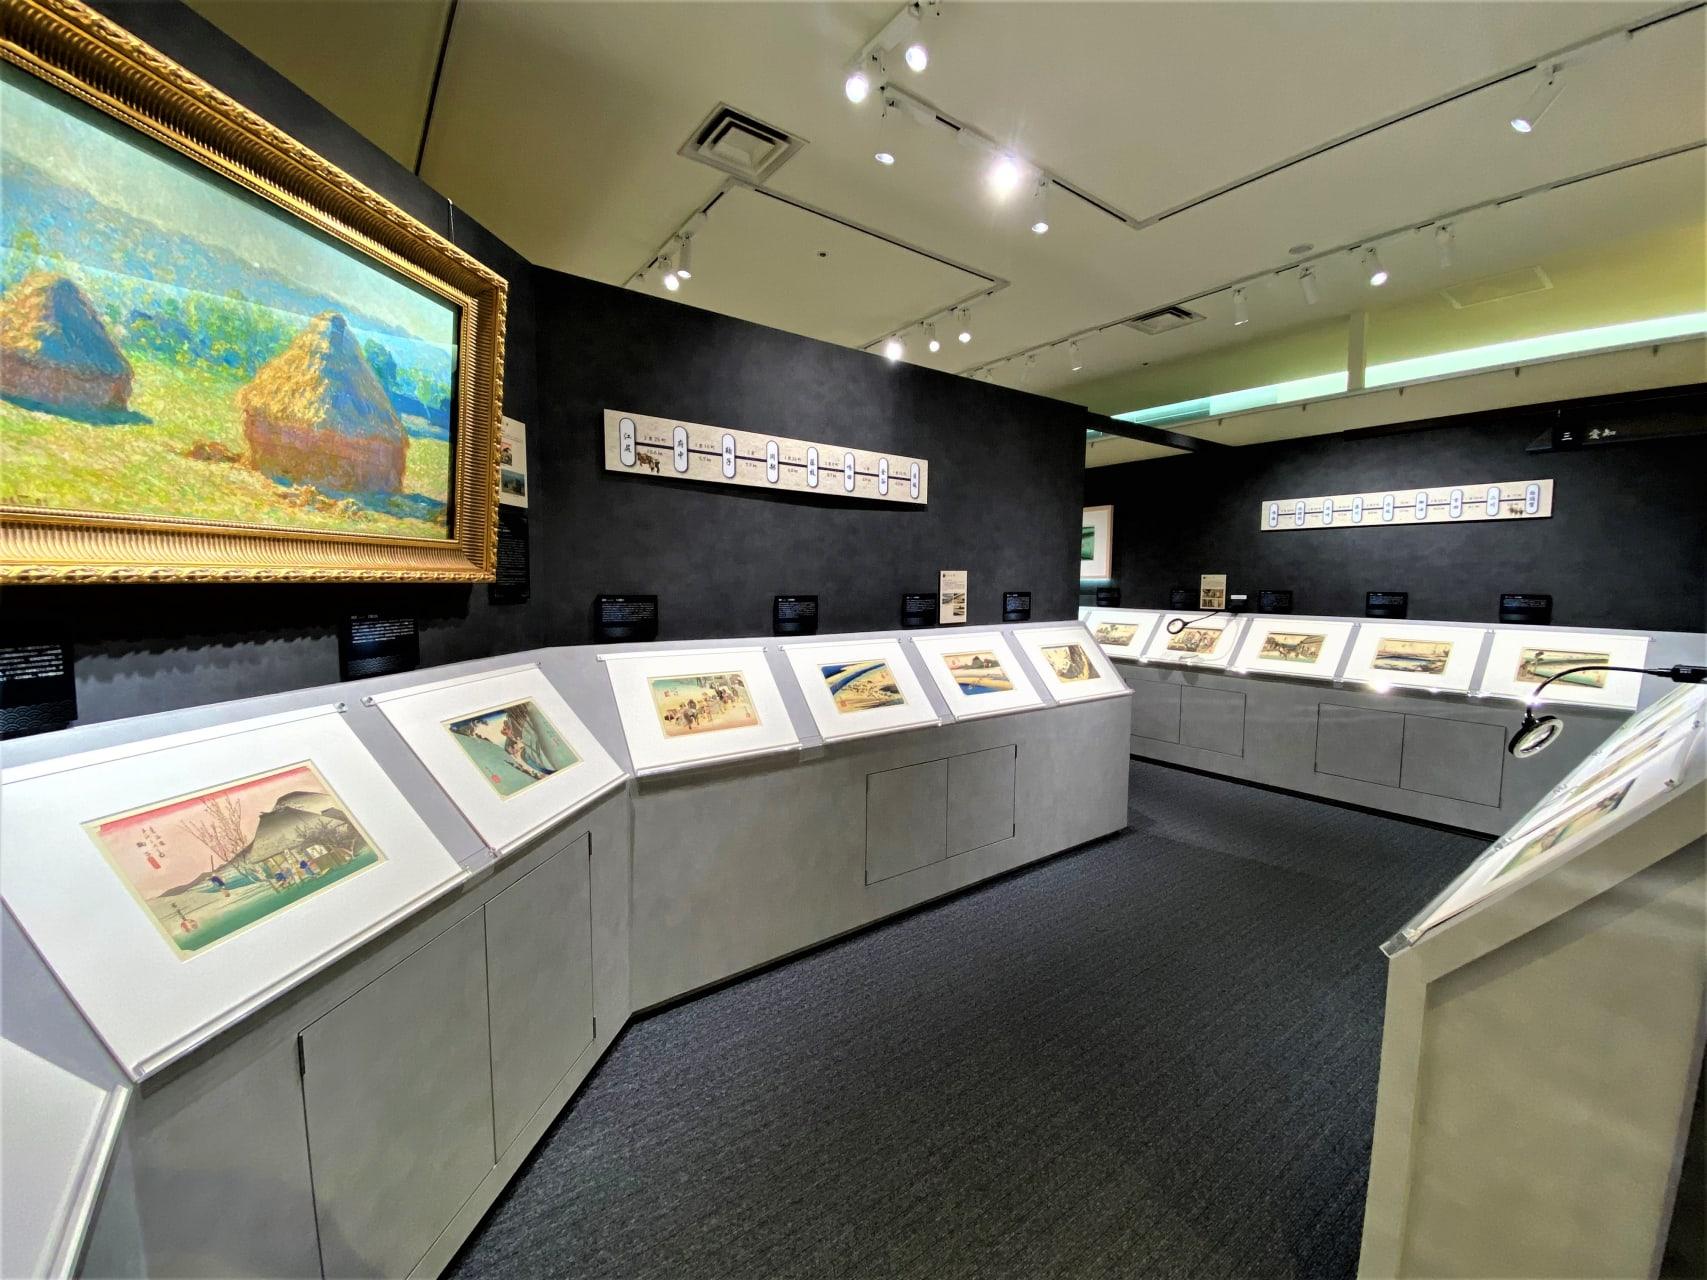 Tokyo - Hiroshige Ukiyo-e - The 53 Stations of the Tokaido - Part I